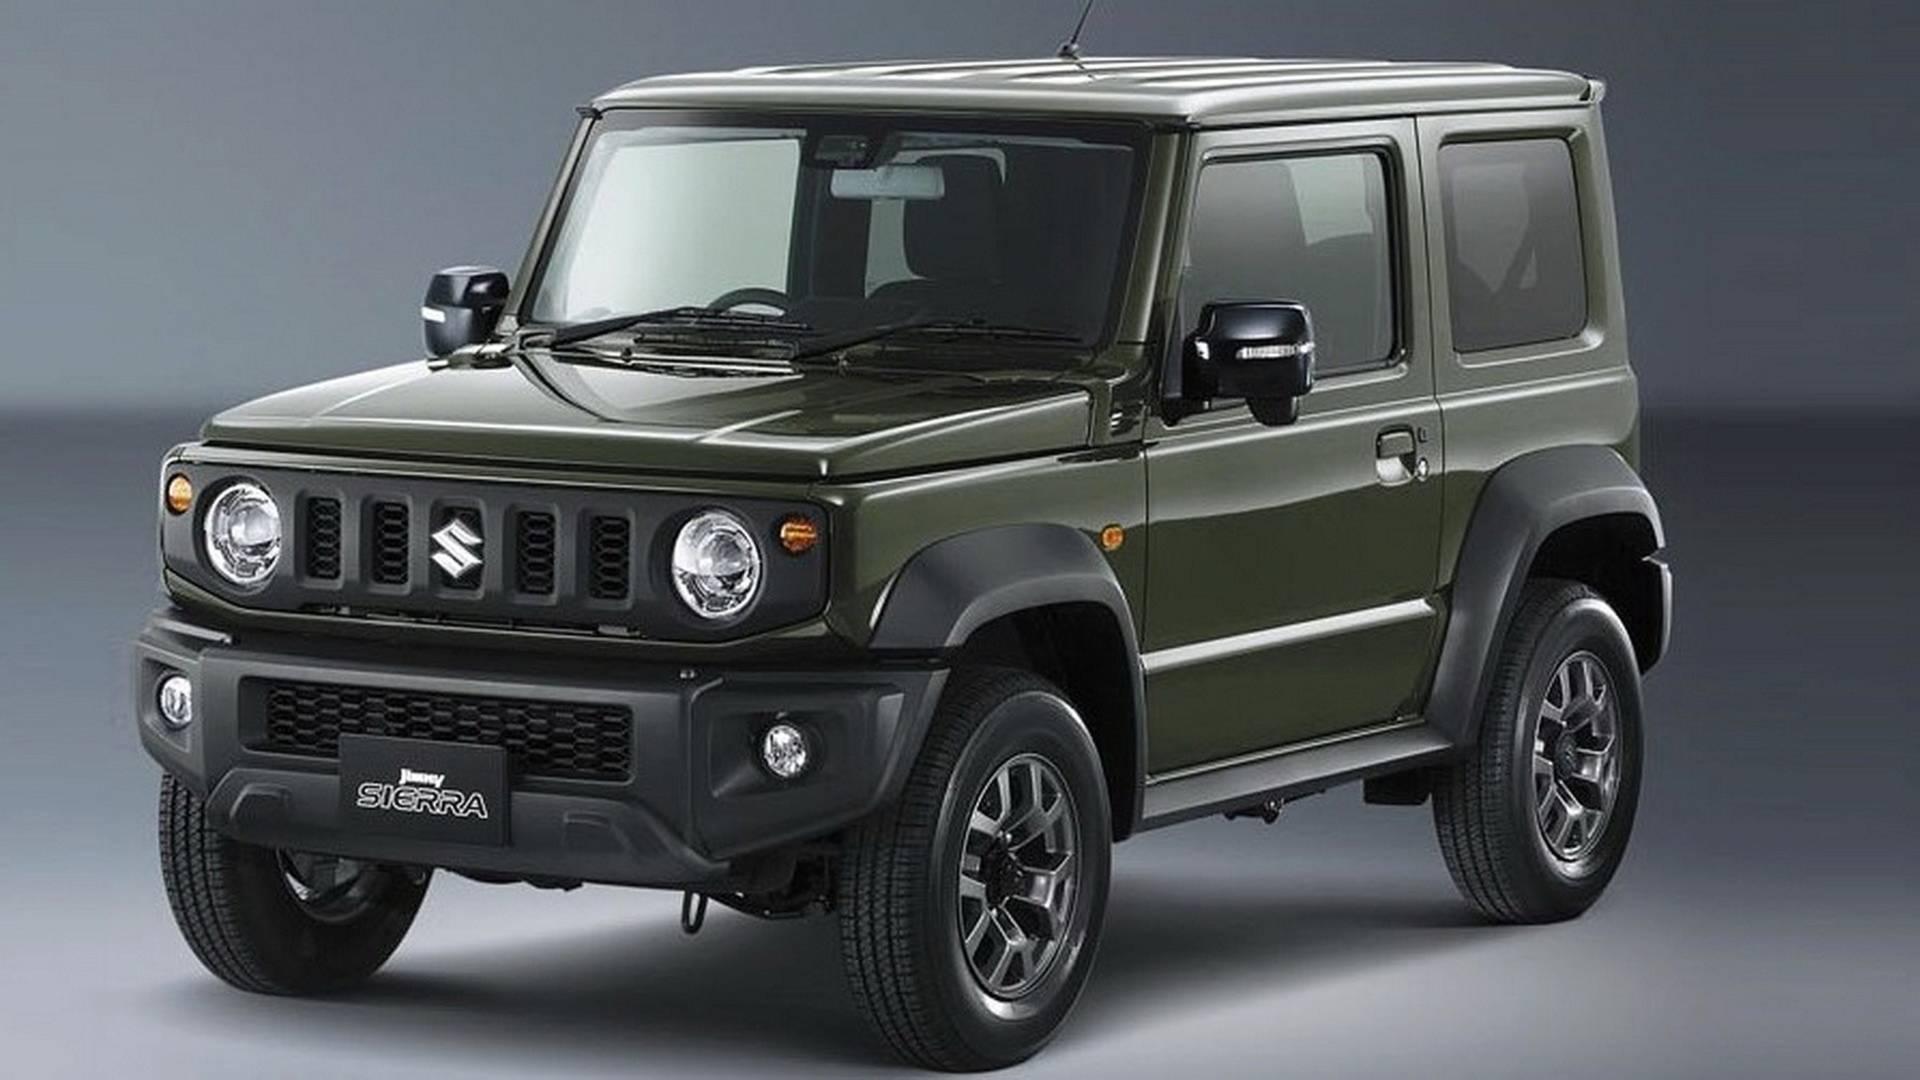 Suzuki >> Nowe, urocze Suzuki Jimny | Project Automotive